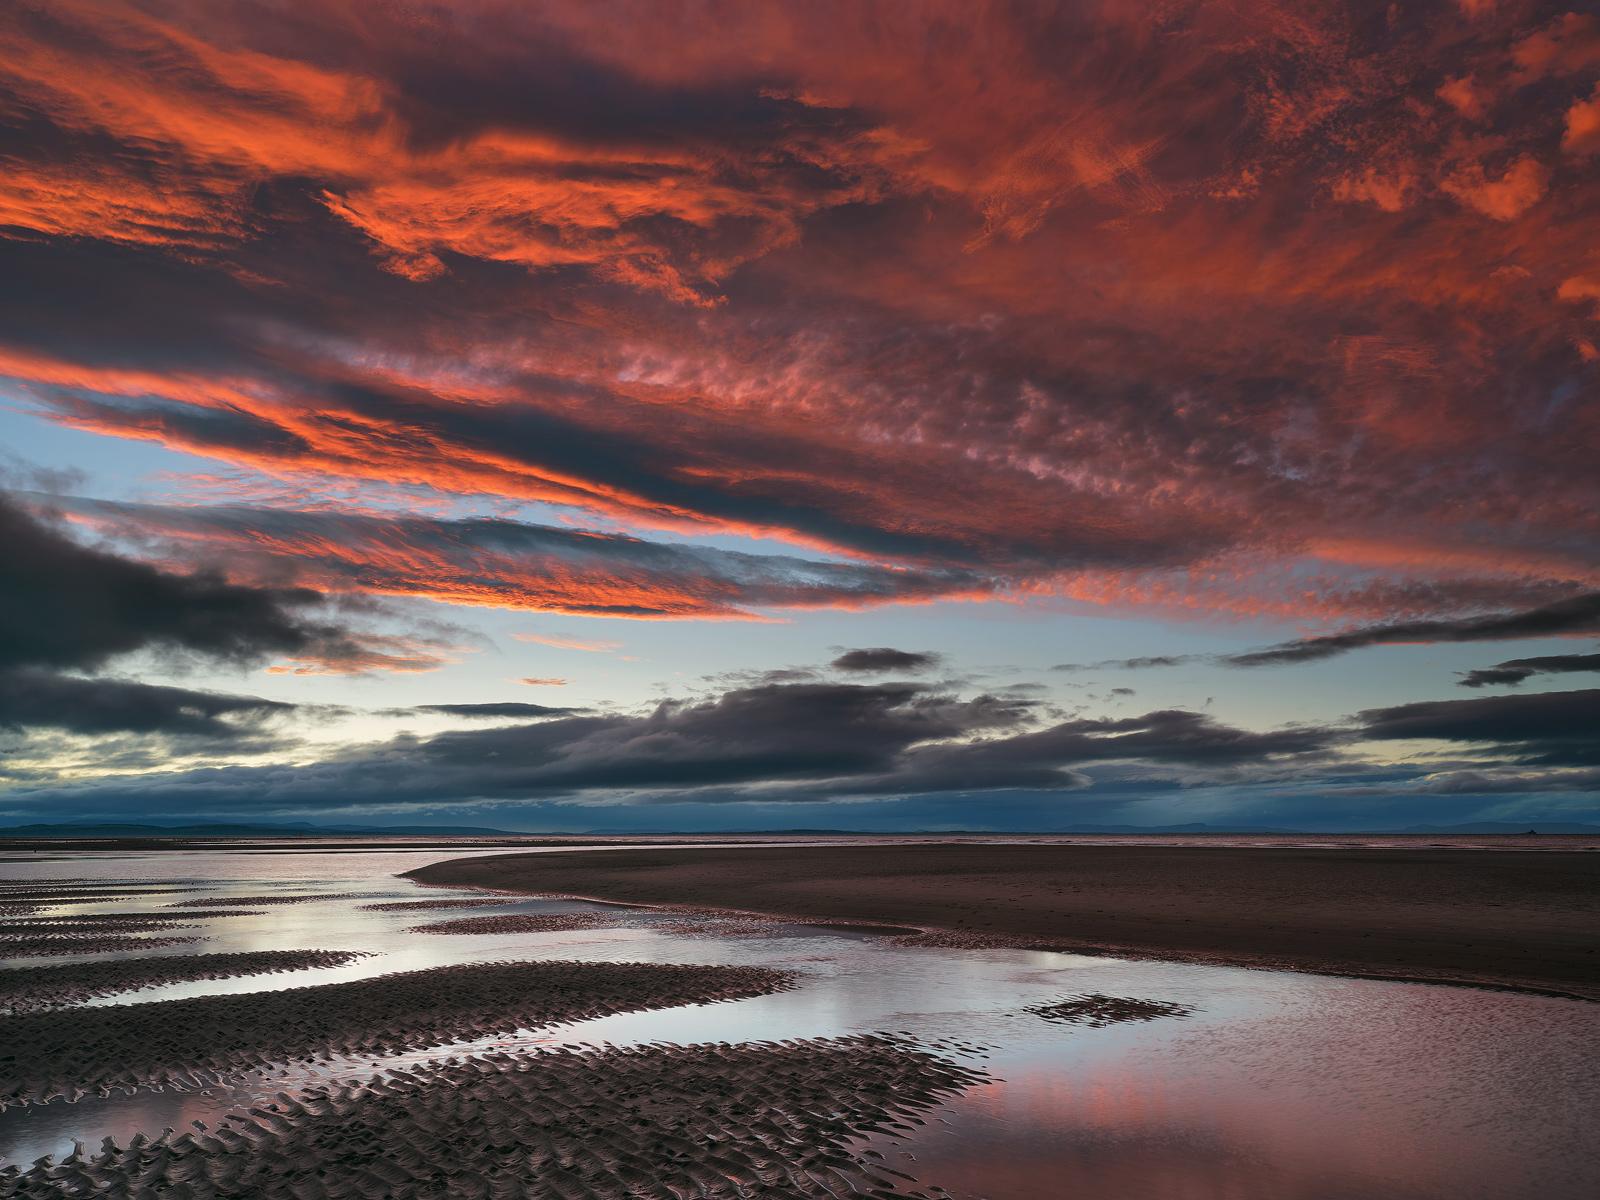 Plumset Findhorn, Findhorn, Moray, Scotland, scarlet, crimson, plum, sky, stunning, cloud, umbrella, fingers, sand, sedu, photo